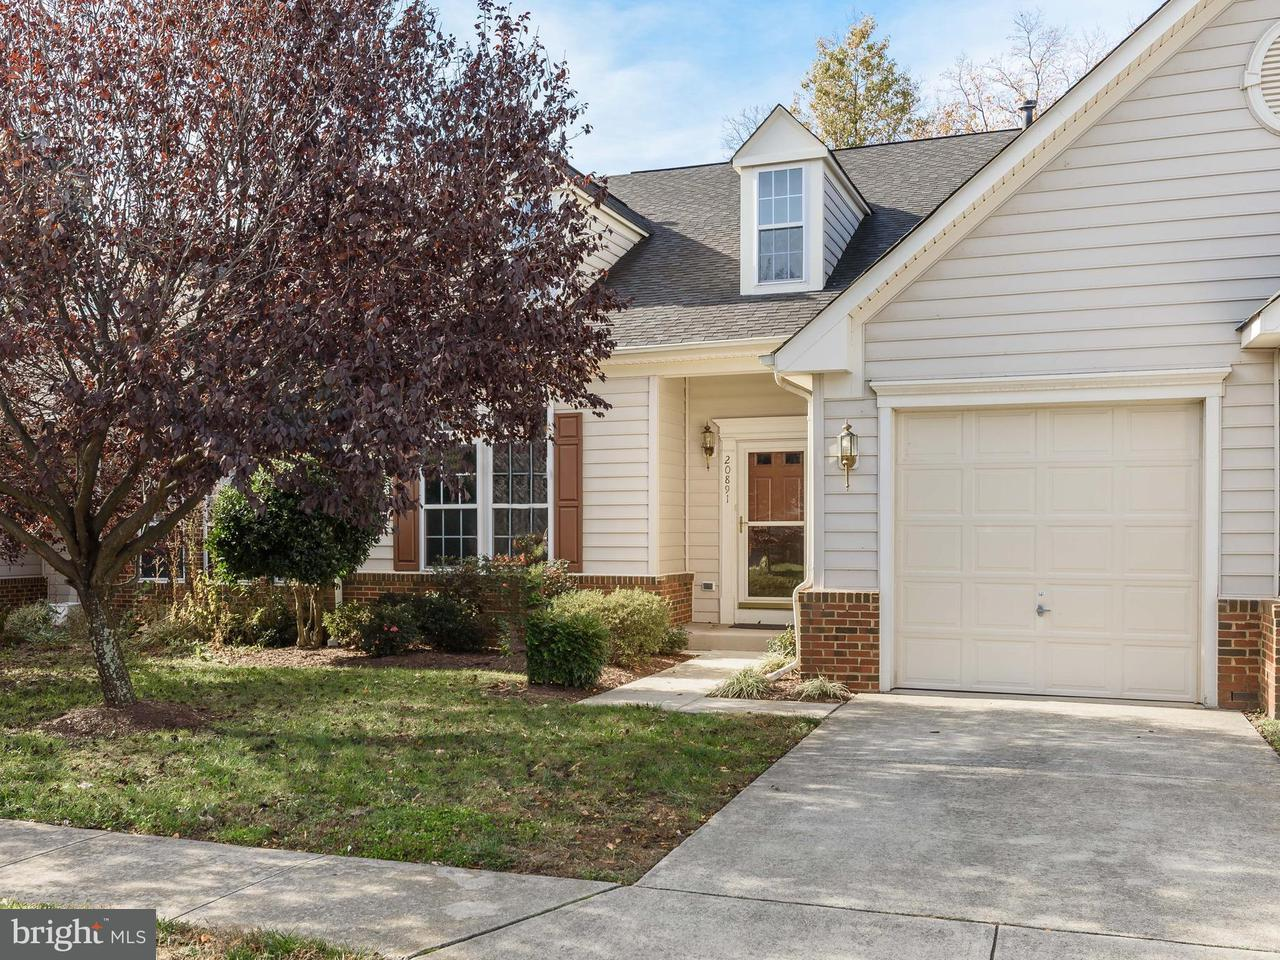 Townhouse for Sale at 20891 KILLAWOG TER 20891 KILLAWOG TER Ashburn, Virginia 20147 United States